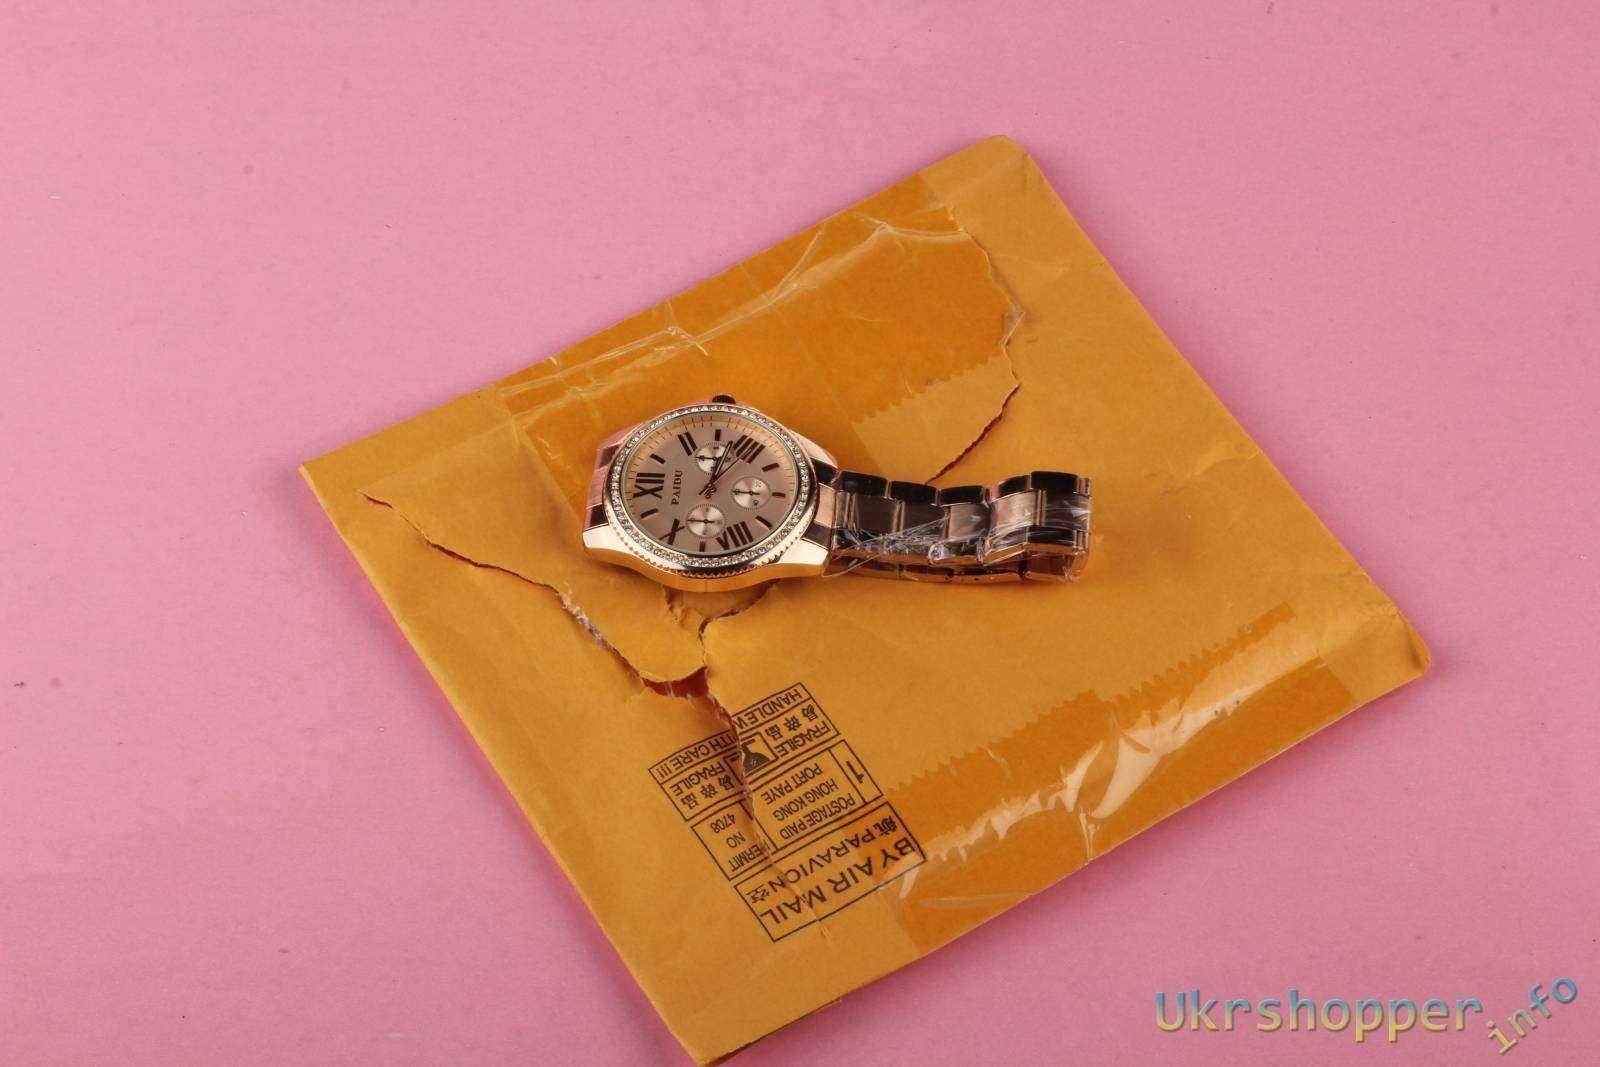 Aliexpress: Часы под червонное золото (Rose Golden Dial)